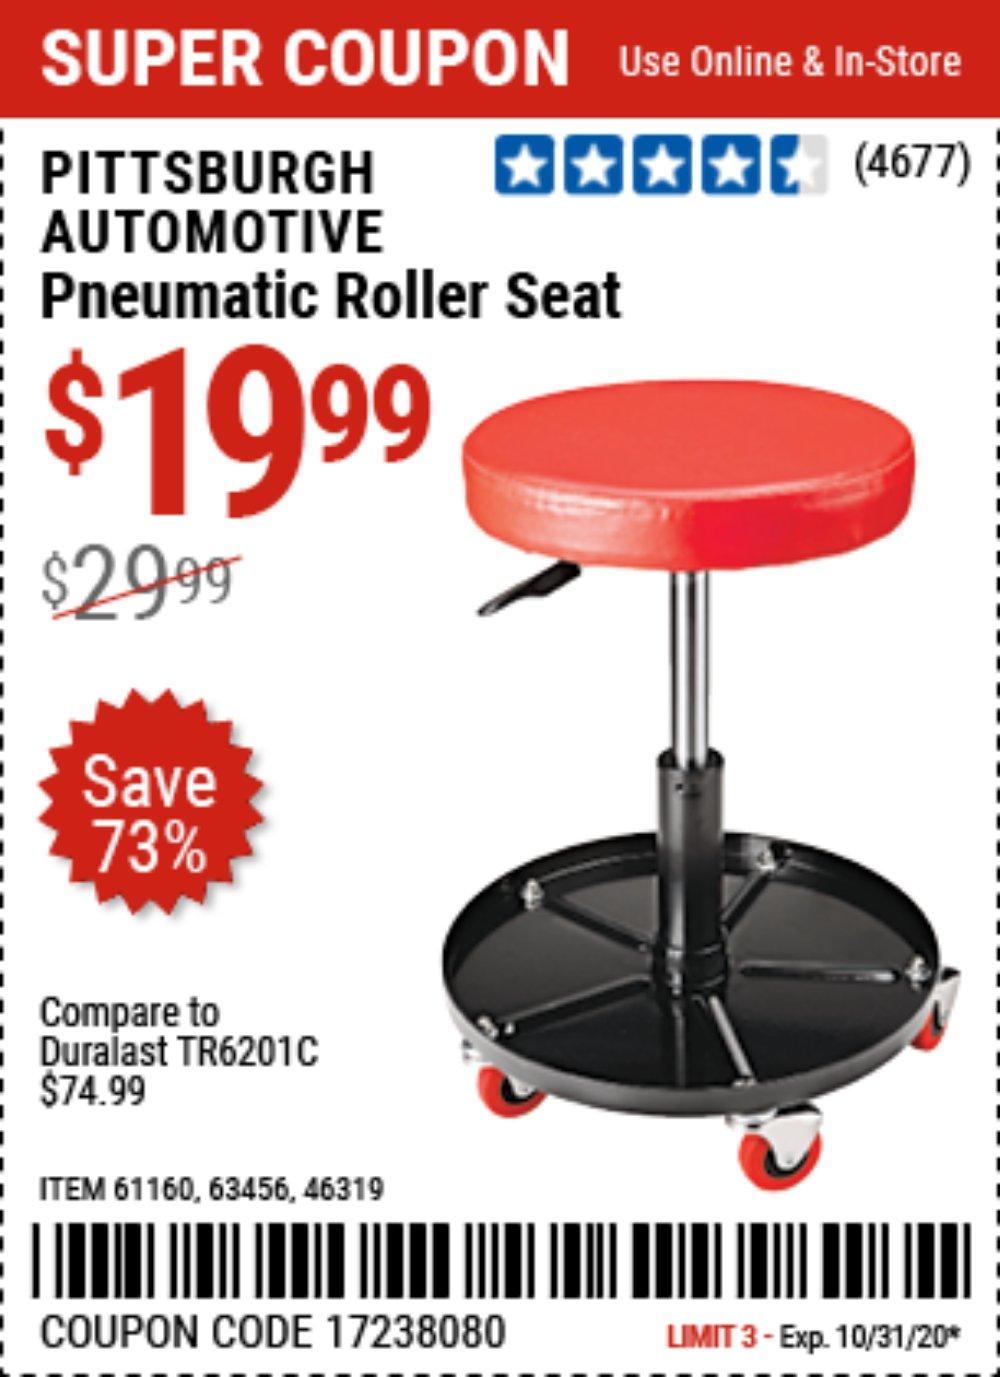 Harbor Freight Coupon, HF Coupons - Mechanic's Roller Seat, Pneumatic Adjustable Roller Seat